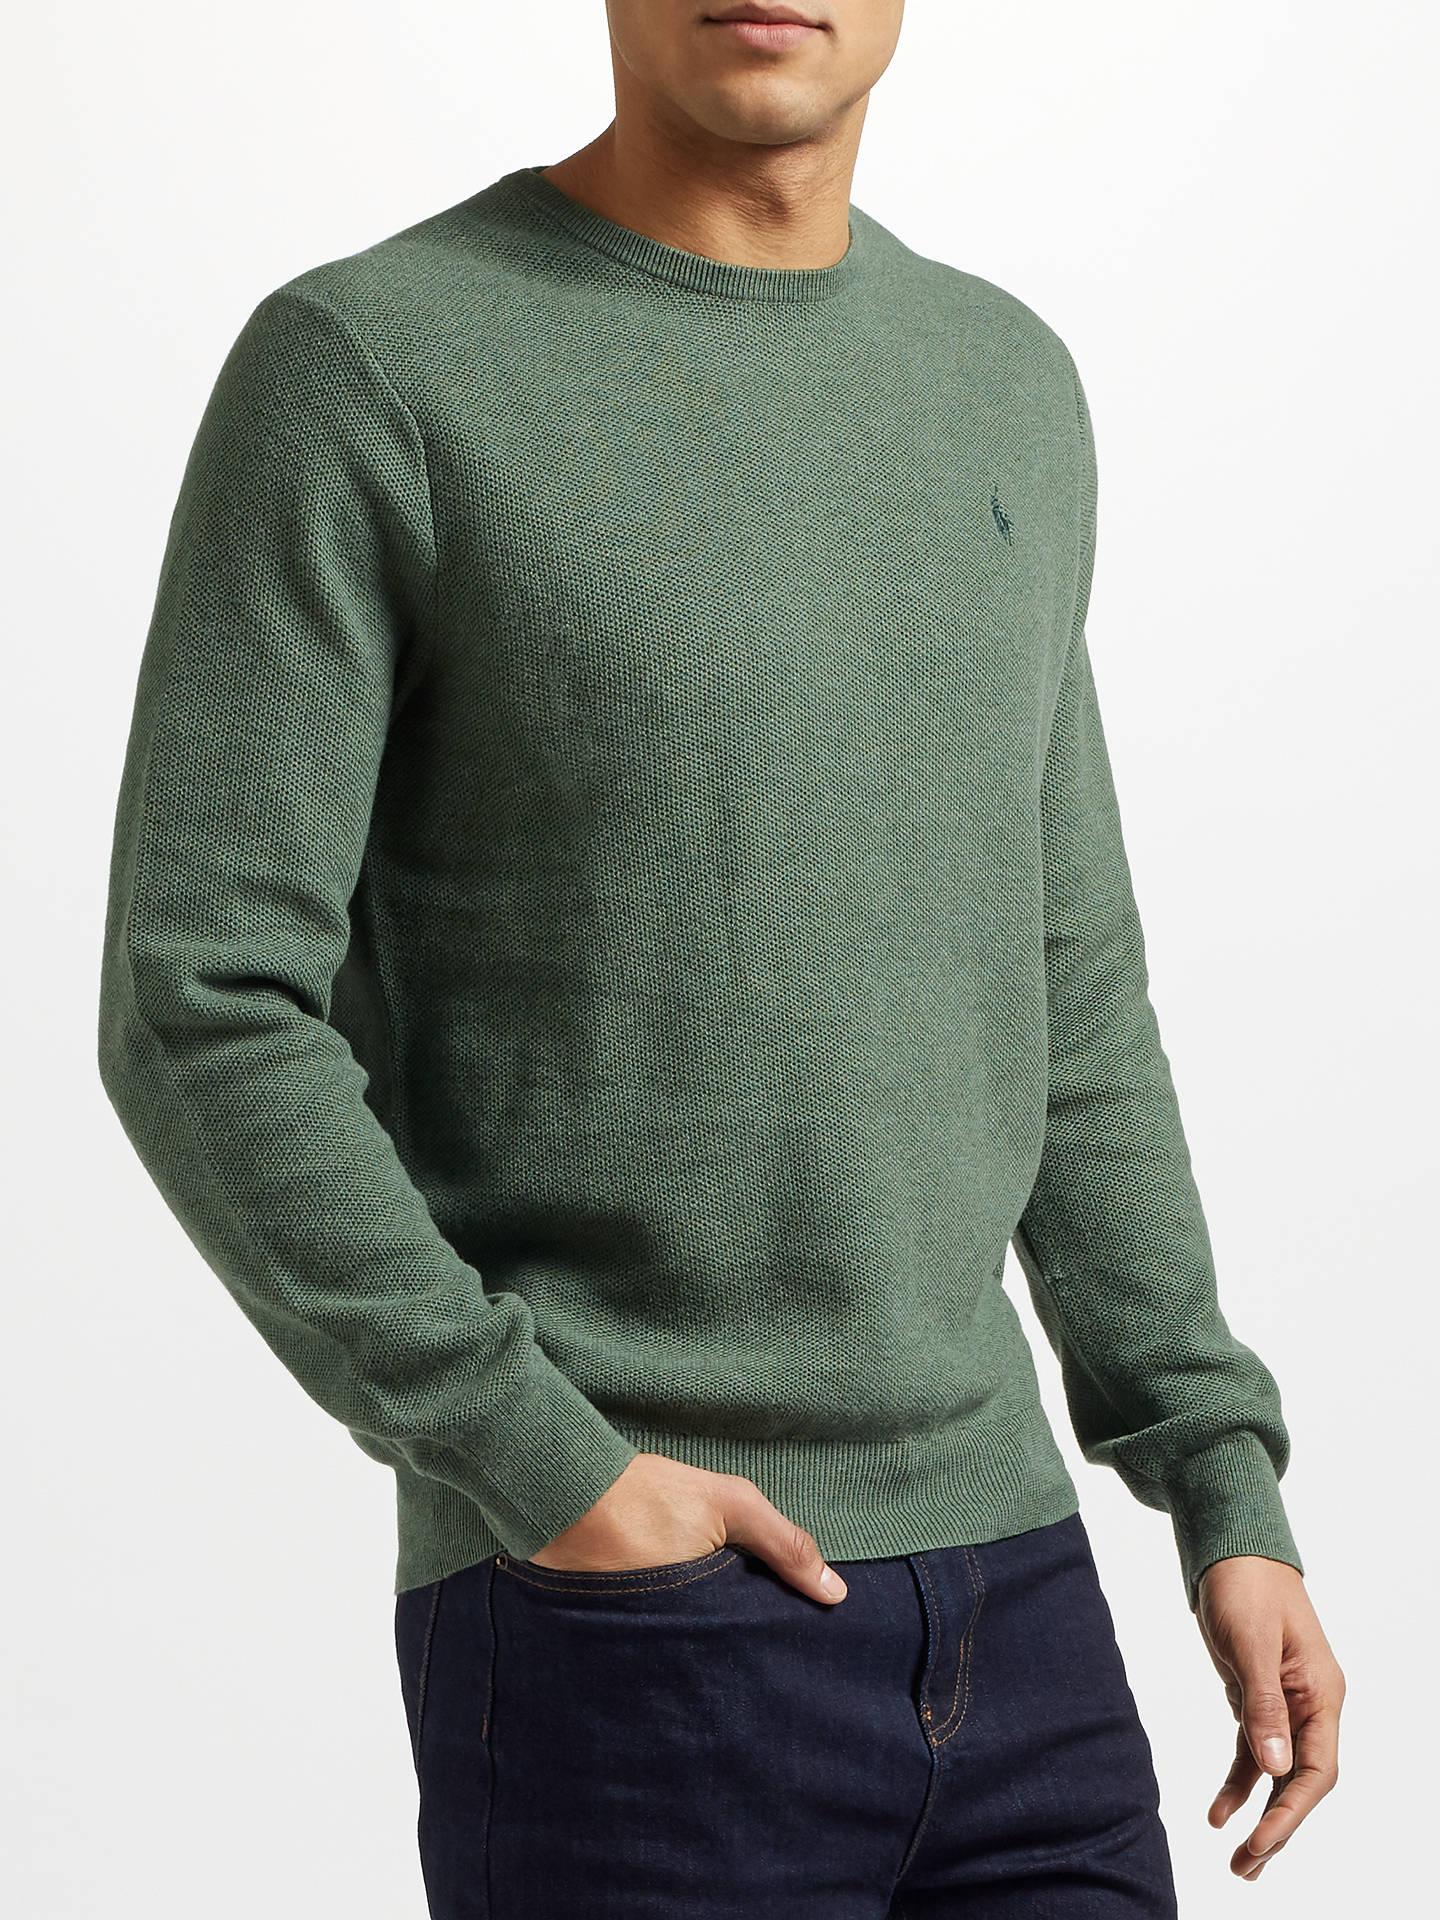 61acfbfa5eab Buy Polo Ralph Lauren Pima Cotton Crew Neck Sweatshirt